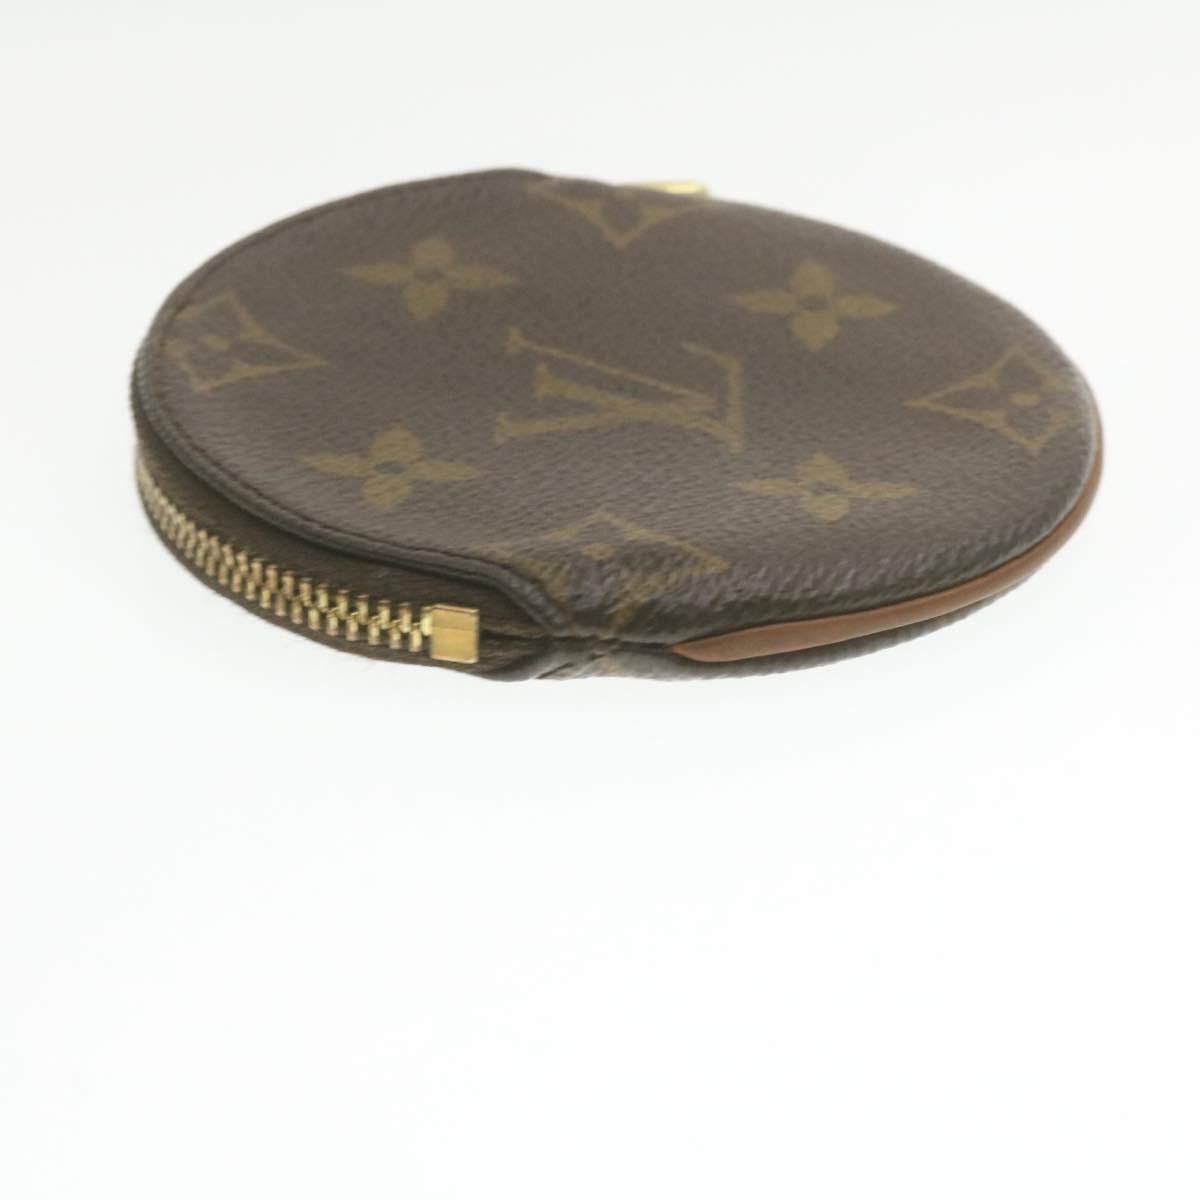 lv round coin purse